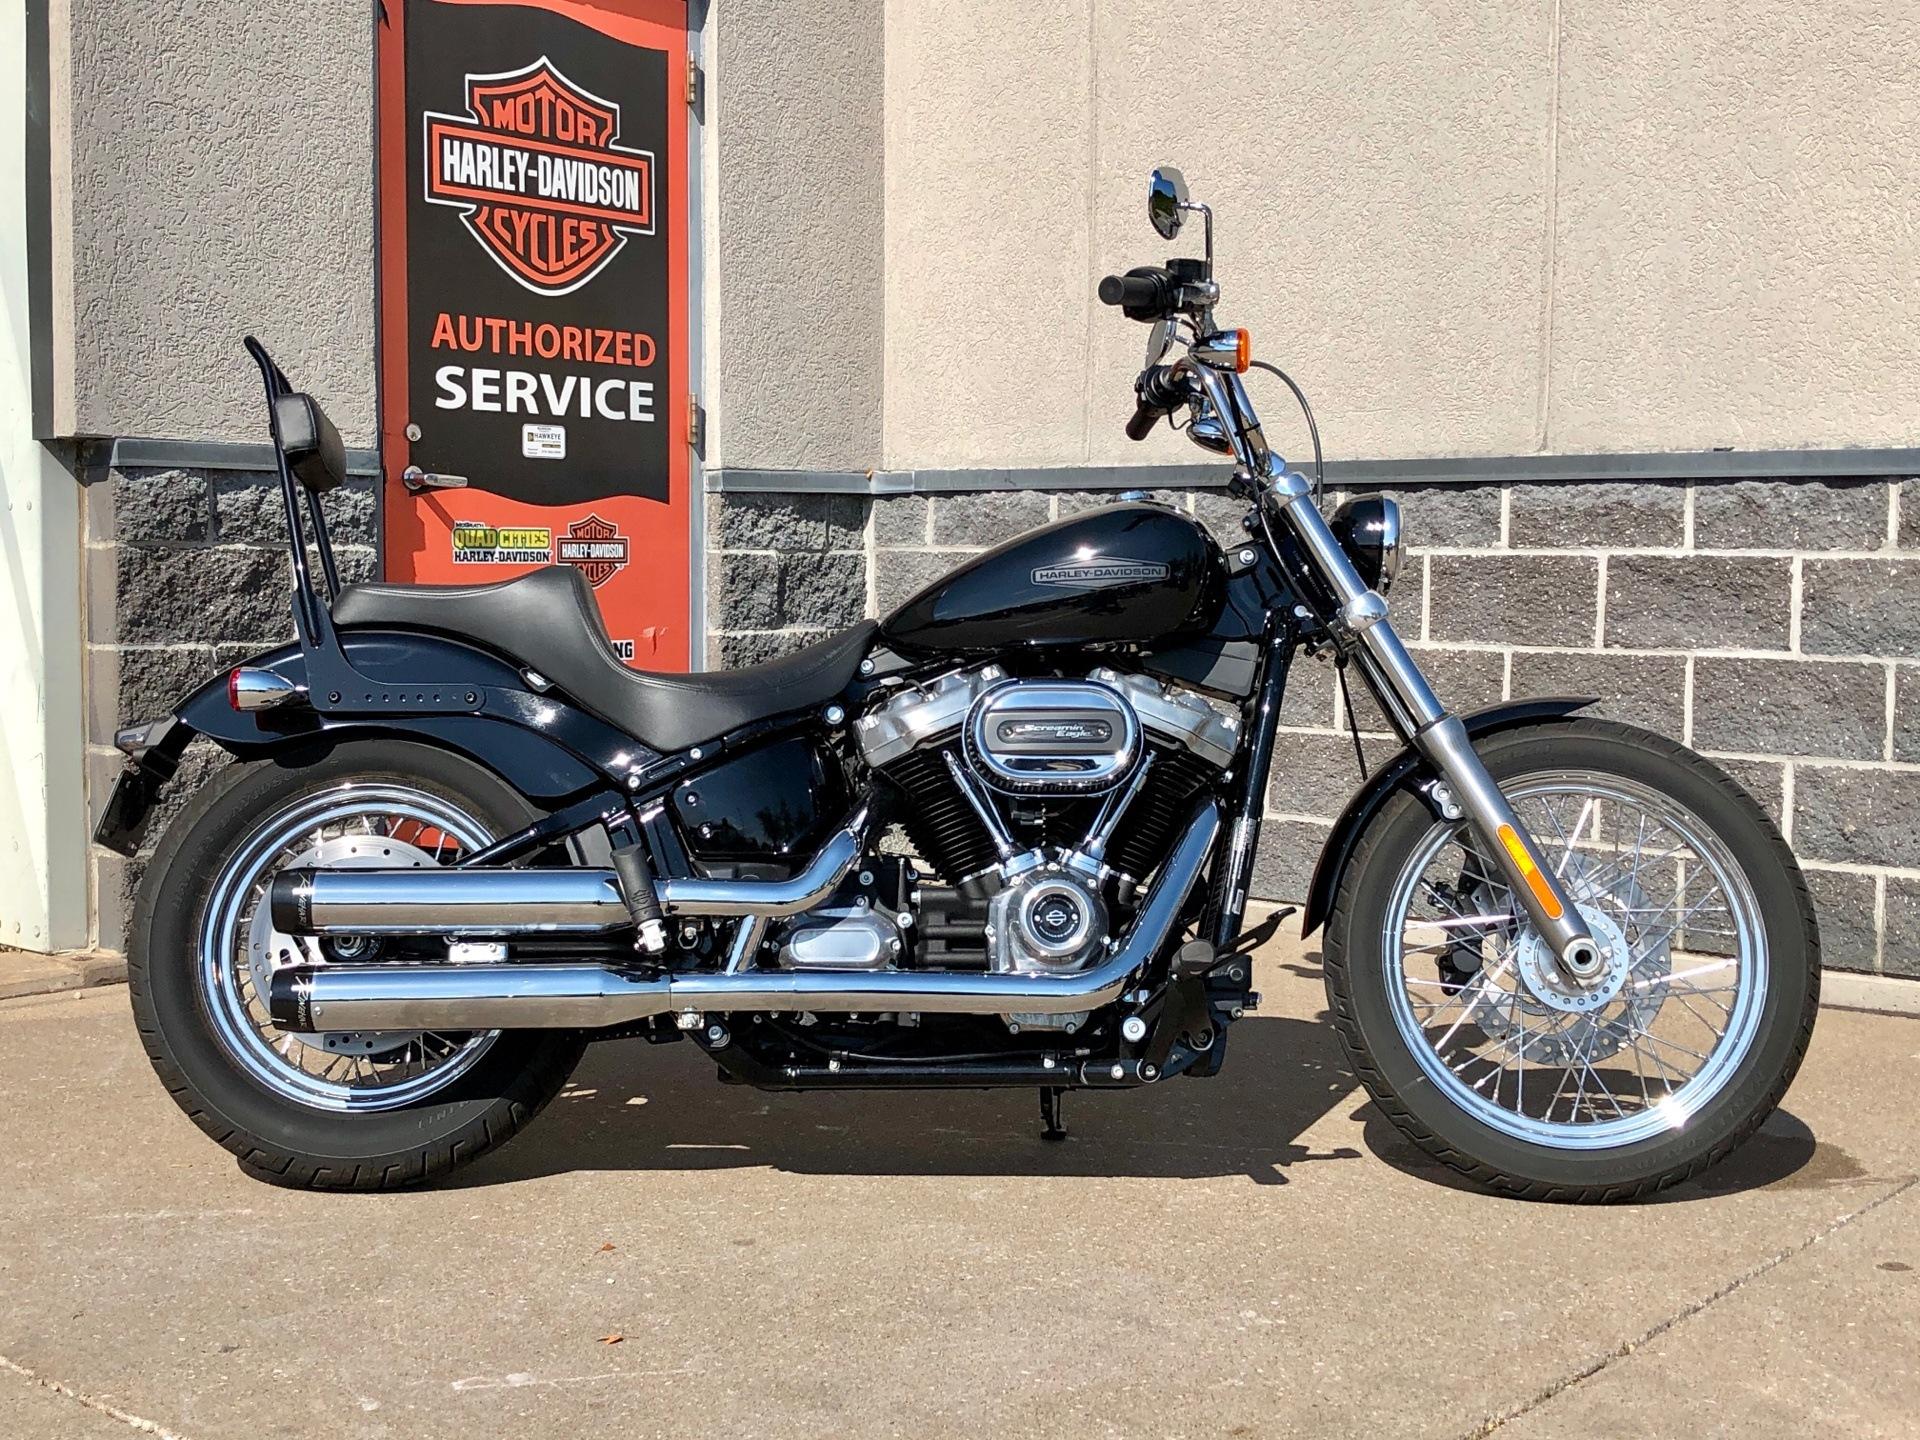 Used 2020 Harley Davidson Softail Standard Vivid Black Motorcycles In Coralville Ia M052694